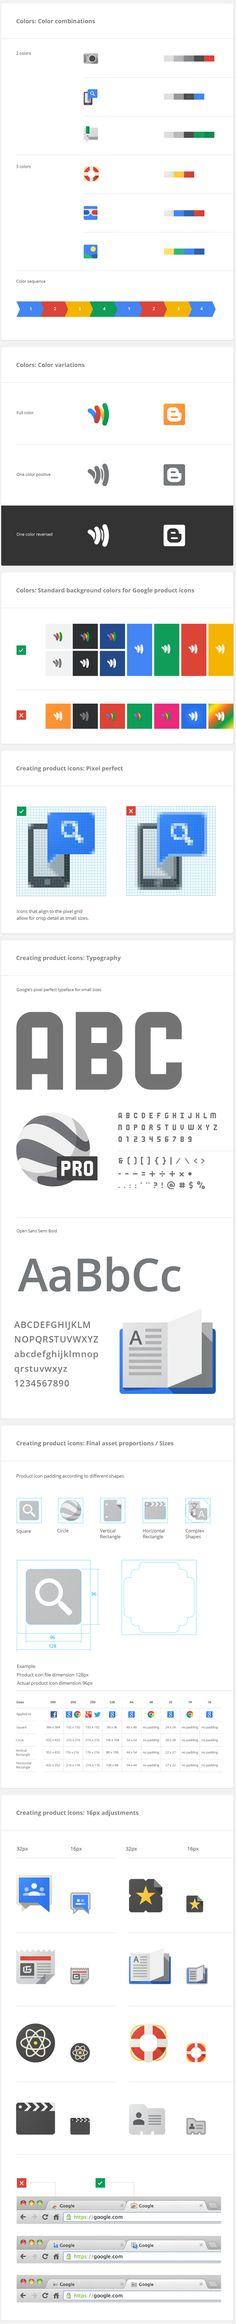 brand librari, icon, googl visual, brand guidelines, brand system, flat design, brand design, brandbook style, visual asset